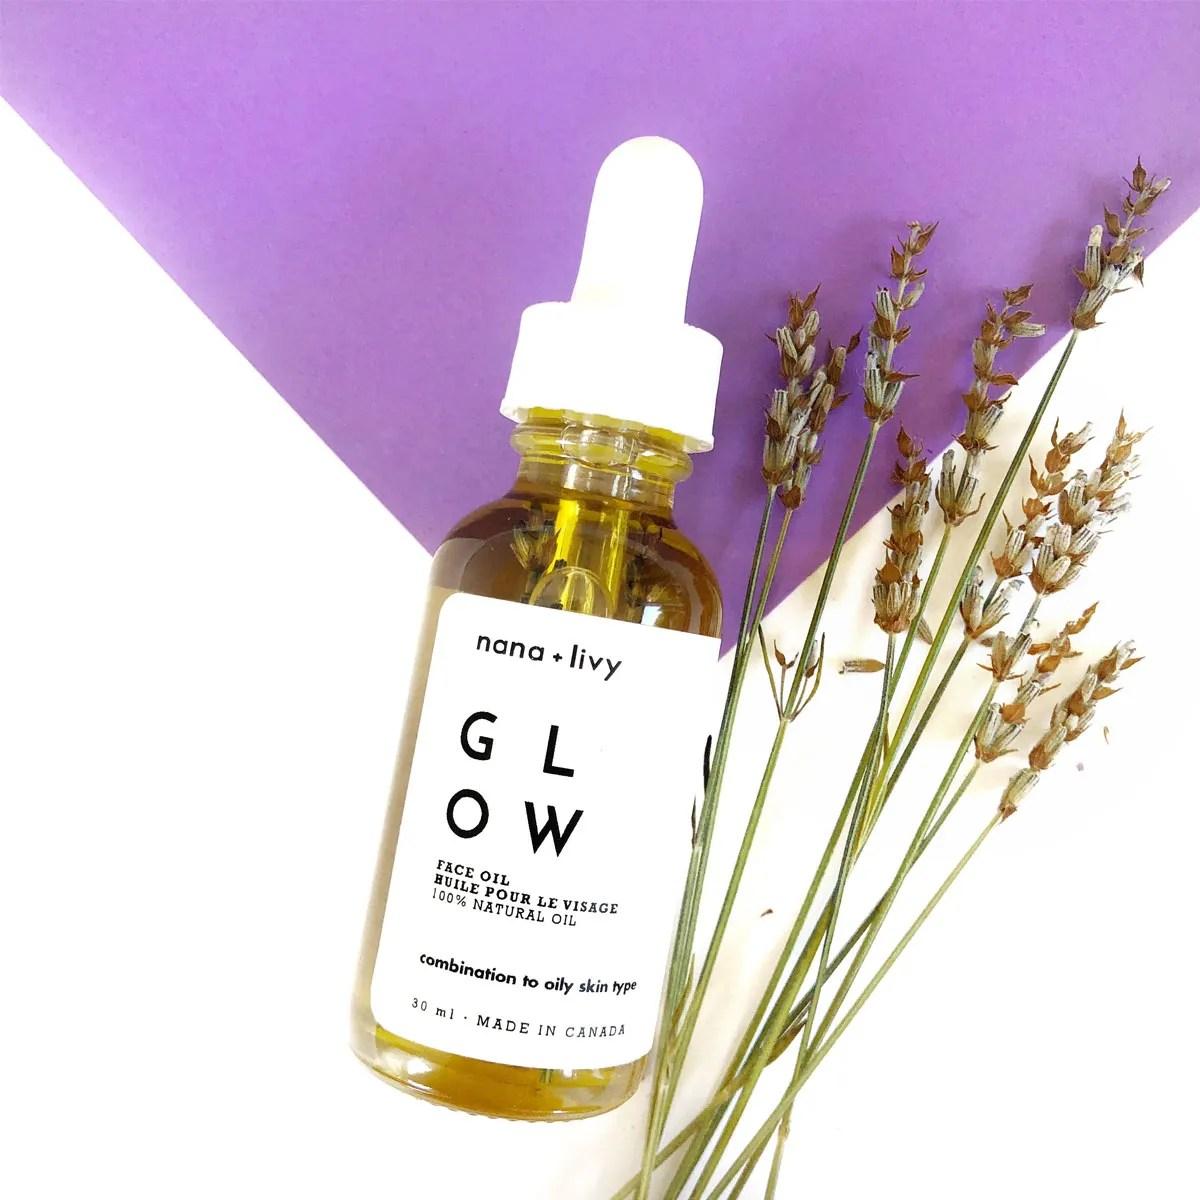 Glow Face Oil